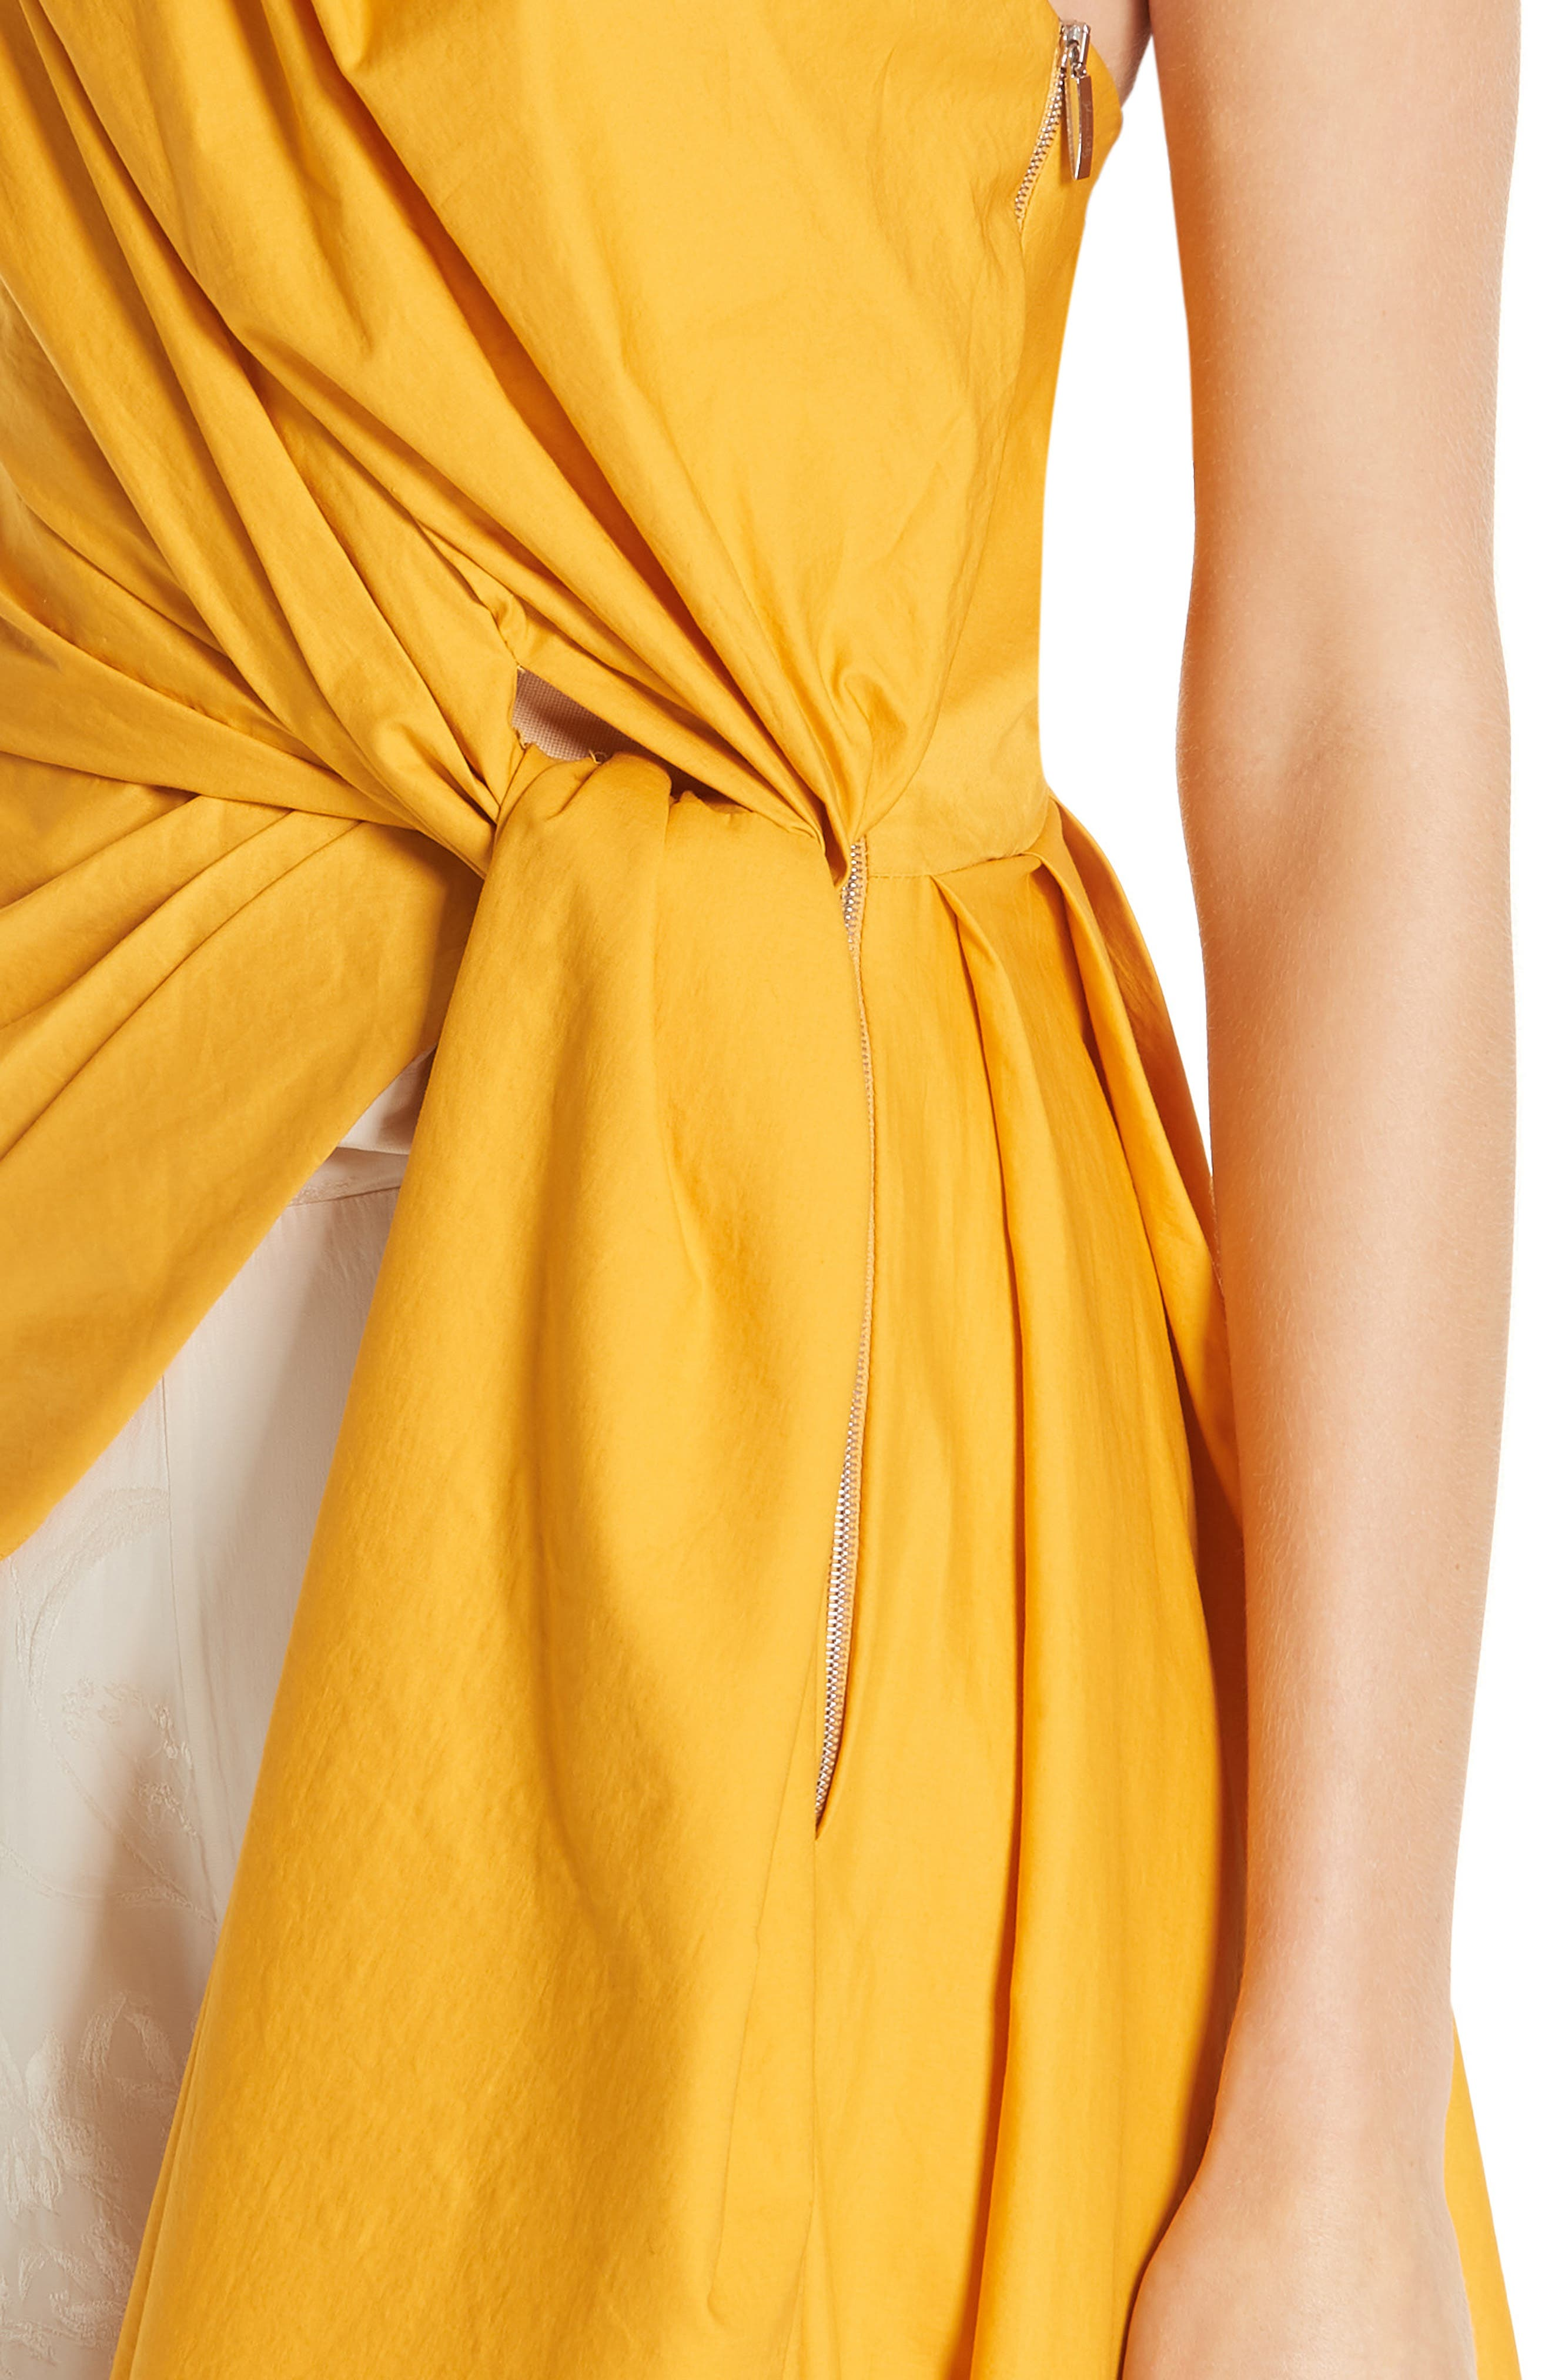 JOHANNA ORTIZ, One-Shoulder Asymmetrical Stretch Poplin Top, Alternate thumbnail 4, color, DANDELION